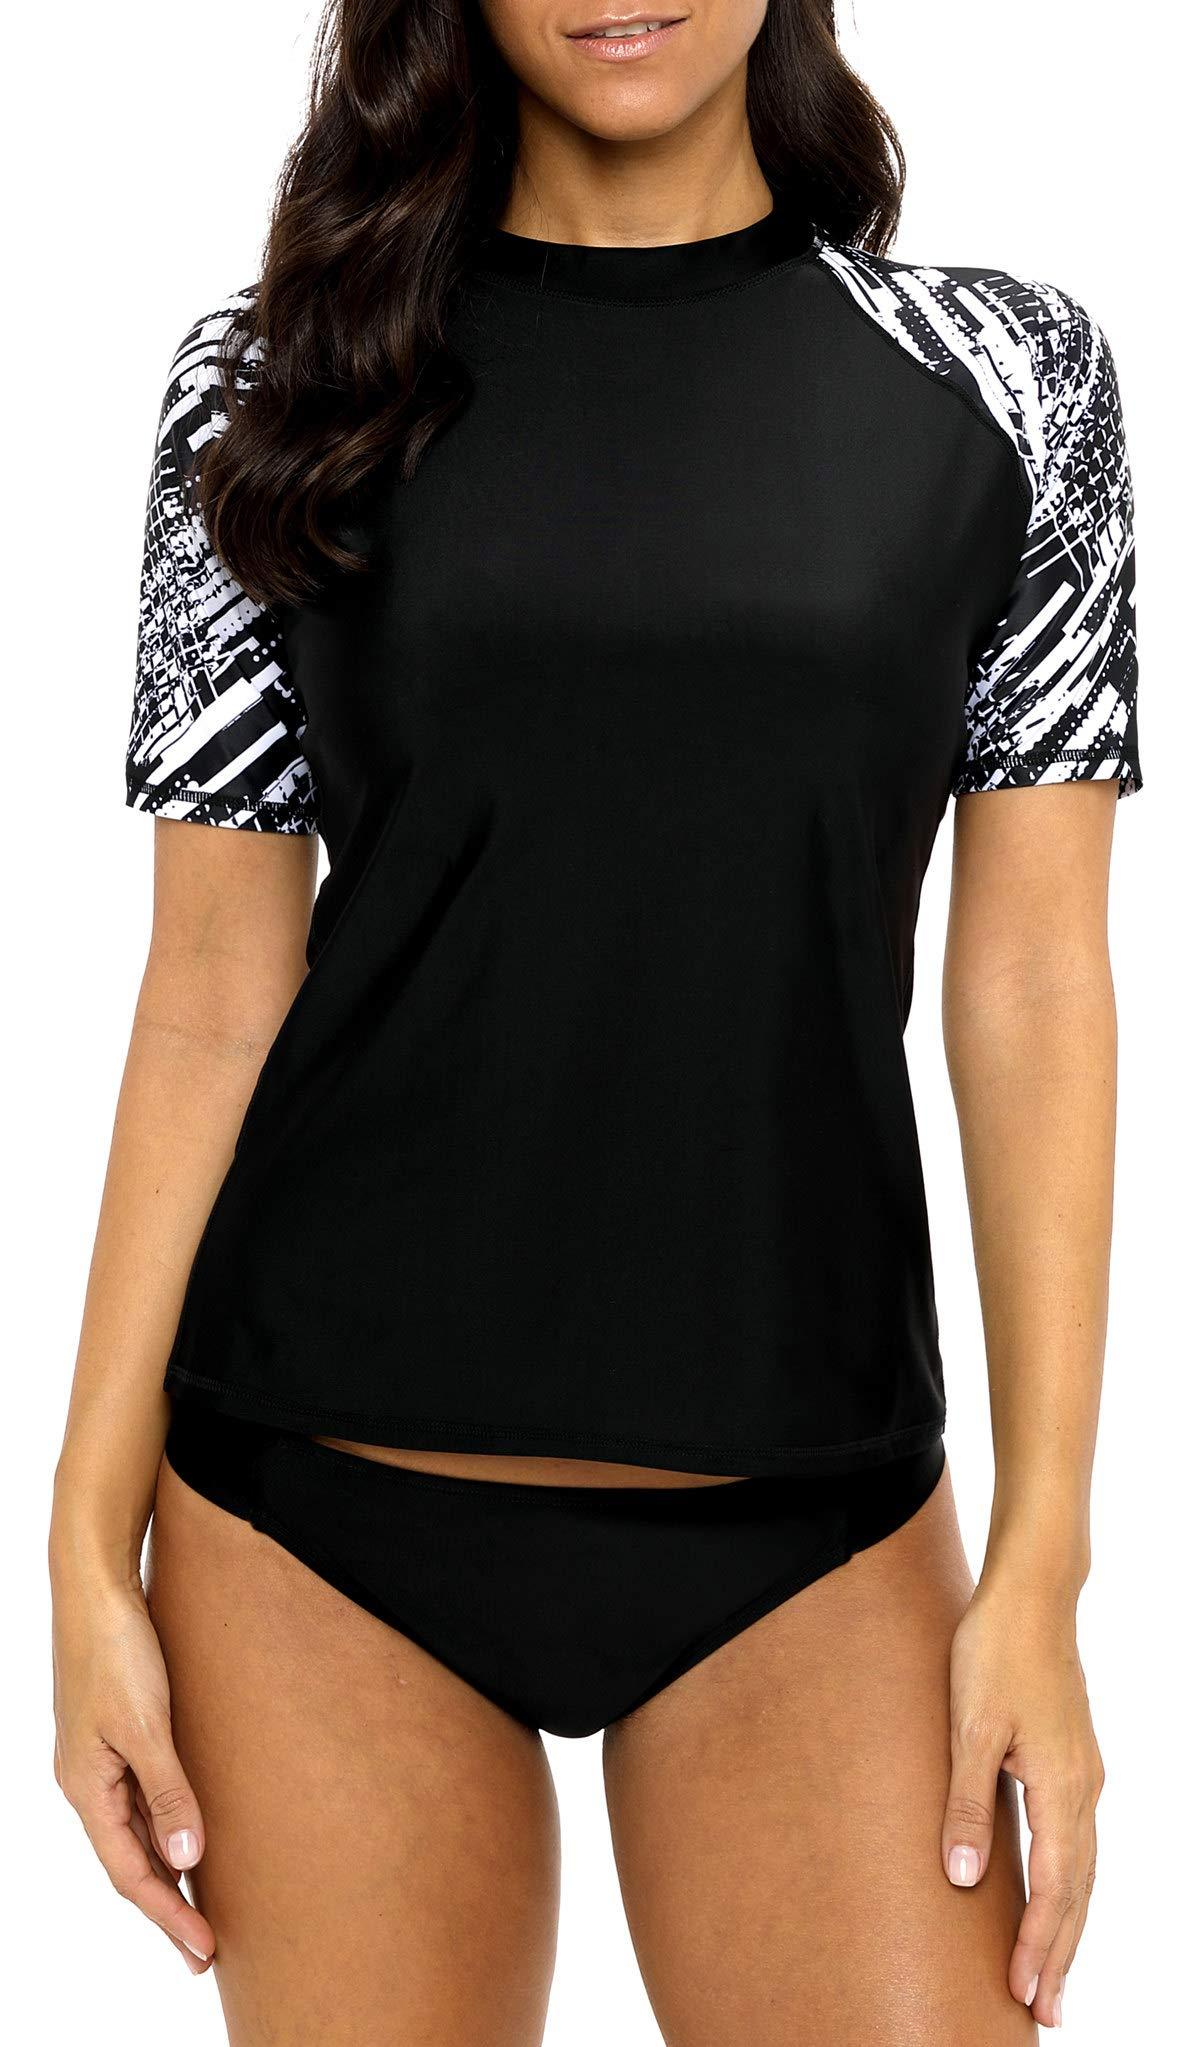 beautyin Women Short Sleeve Rash Guard Sun Protection Surfing Shirt Swimwear 2XL by beautyin